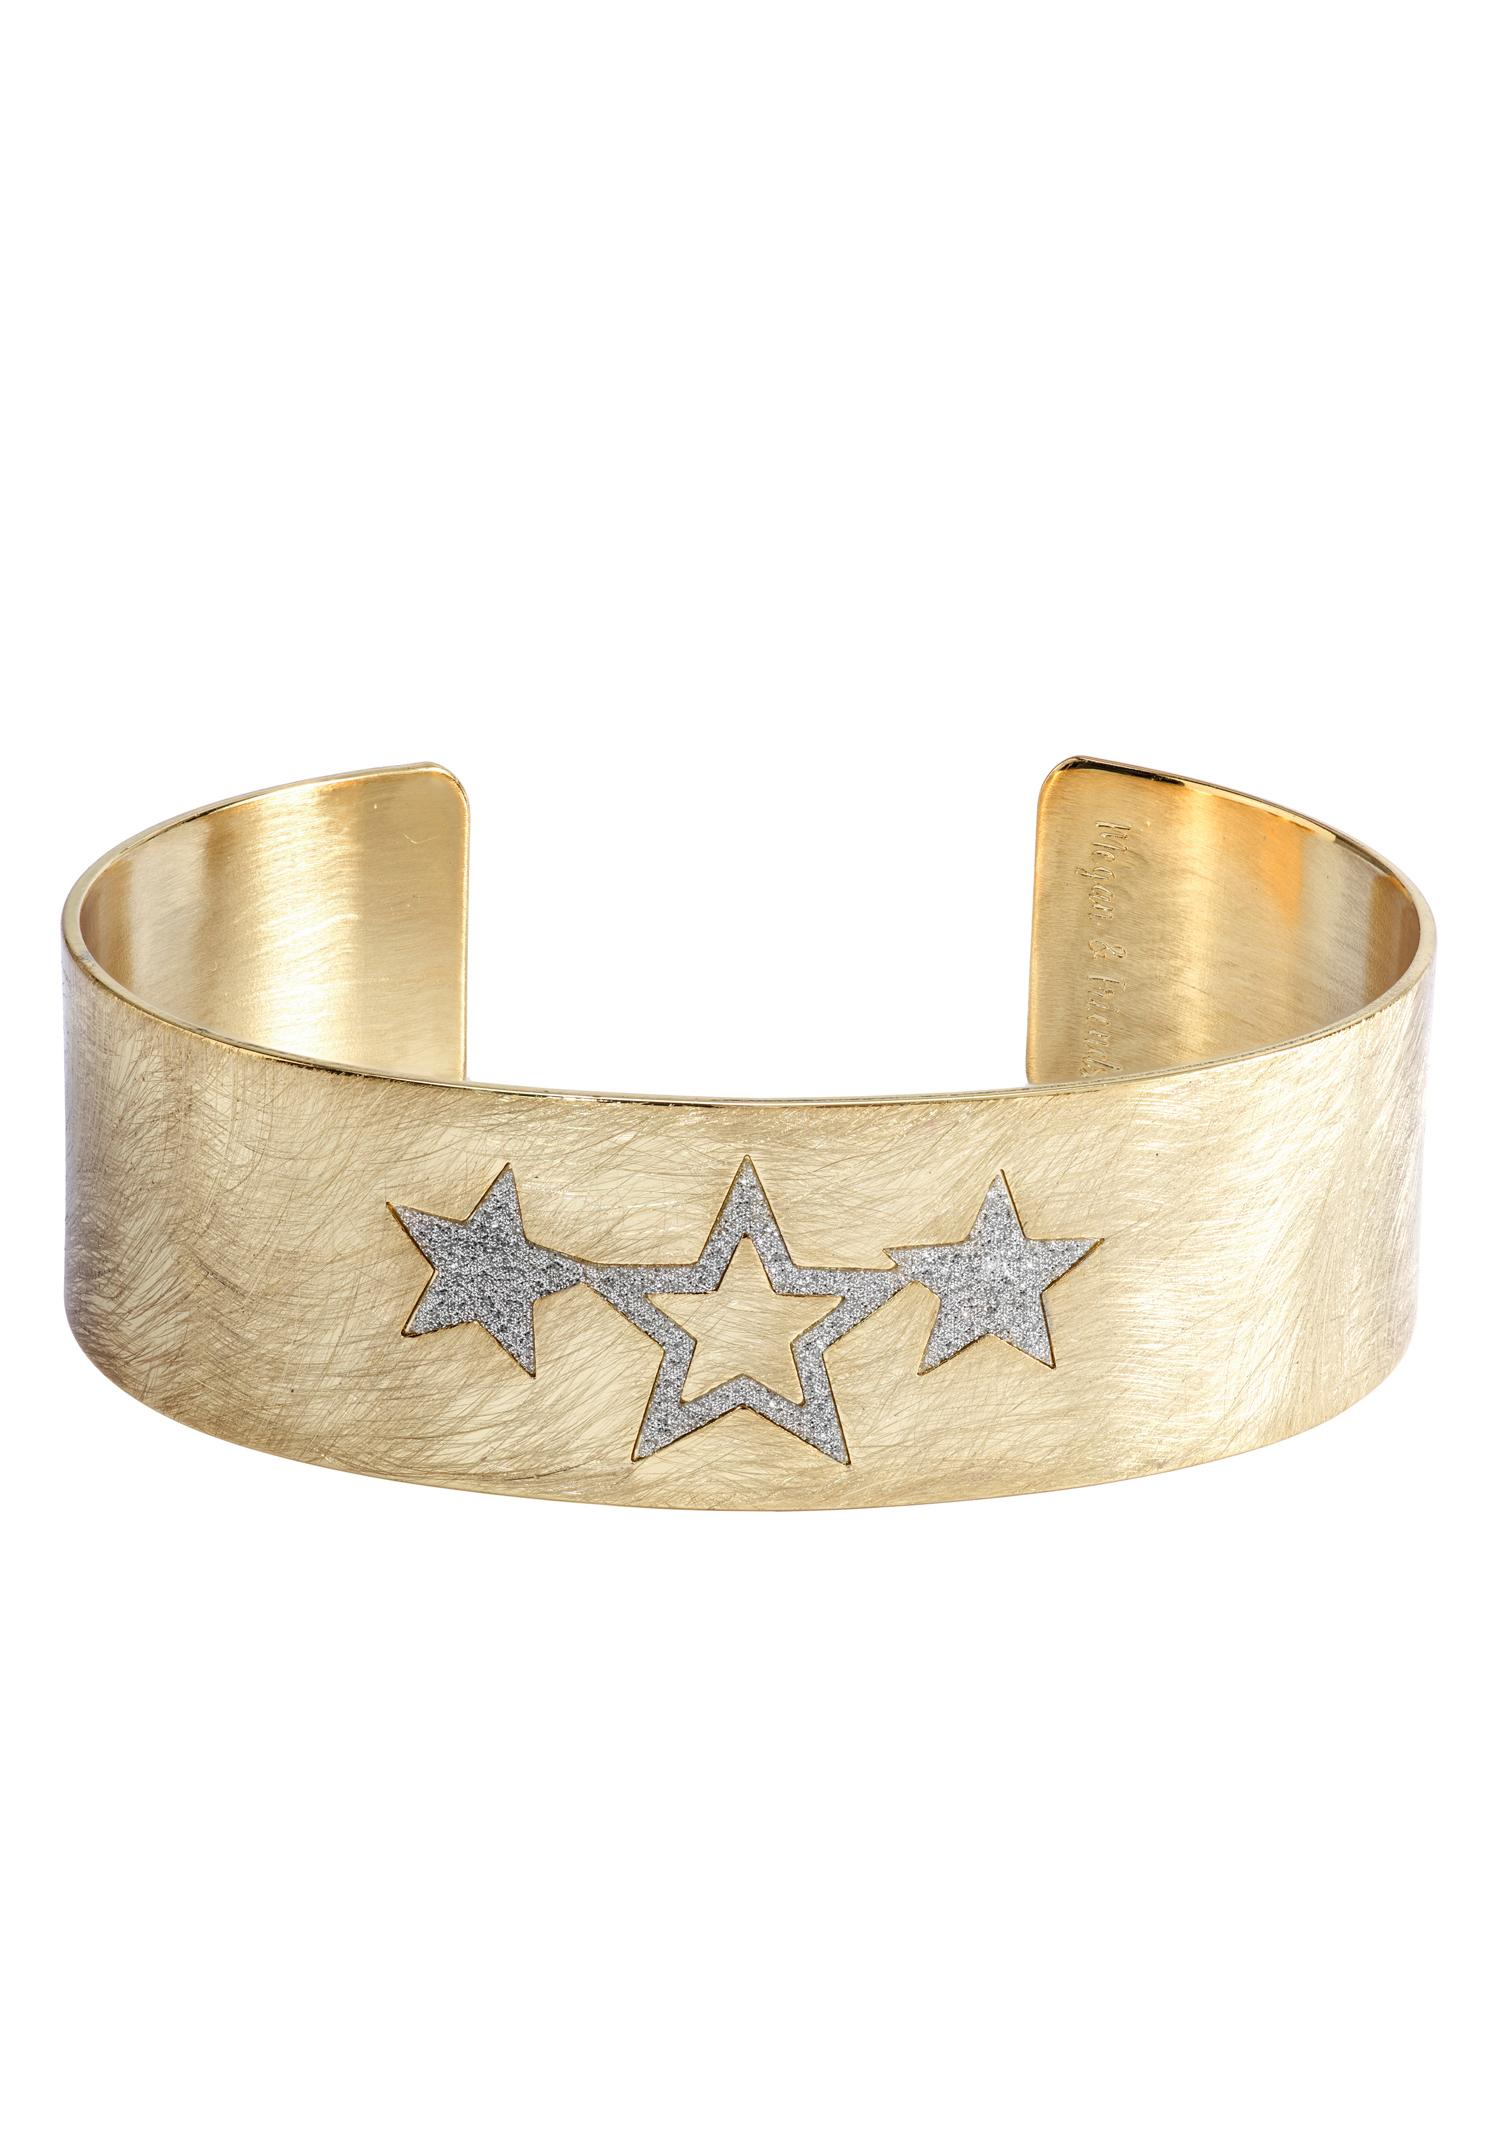 Megan & Friends Armspange »STARS, Sterne, MF20090-02«   Schmuck > Armbänder > Armspangen   Megan & Friends